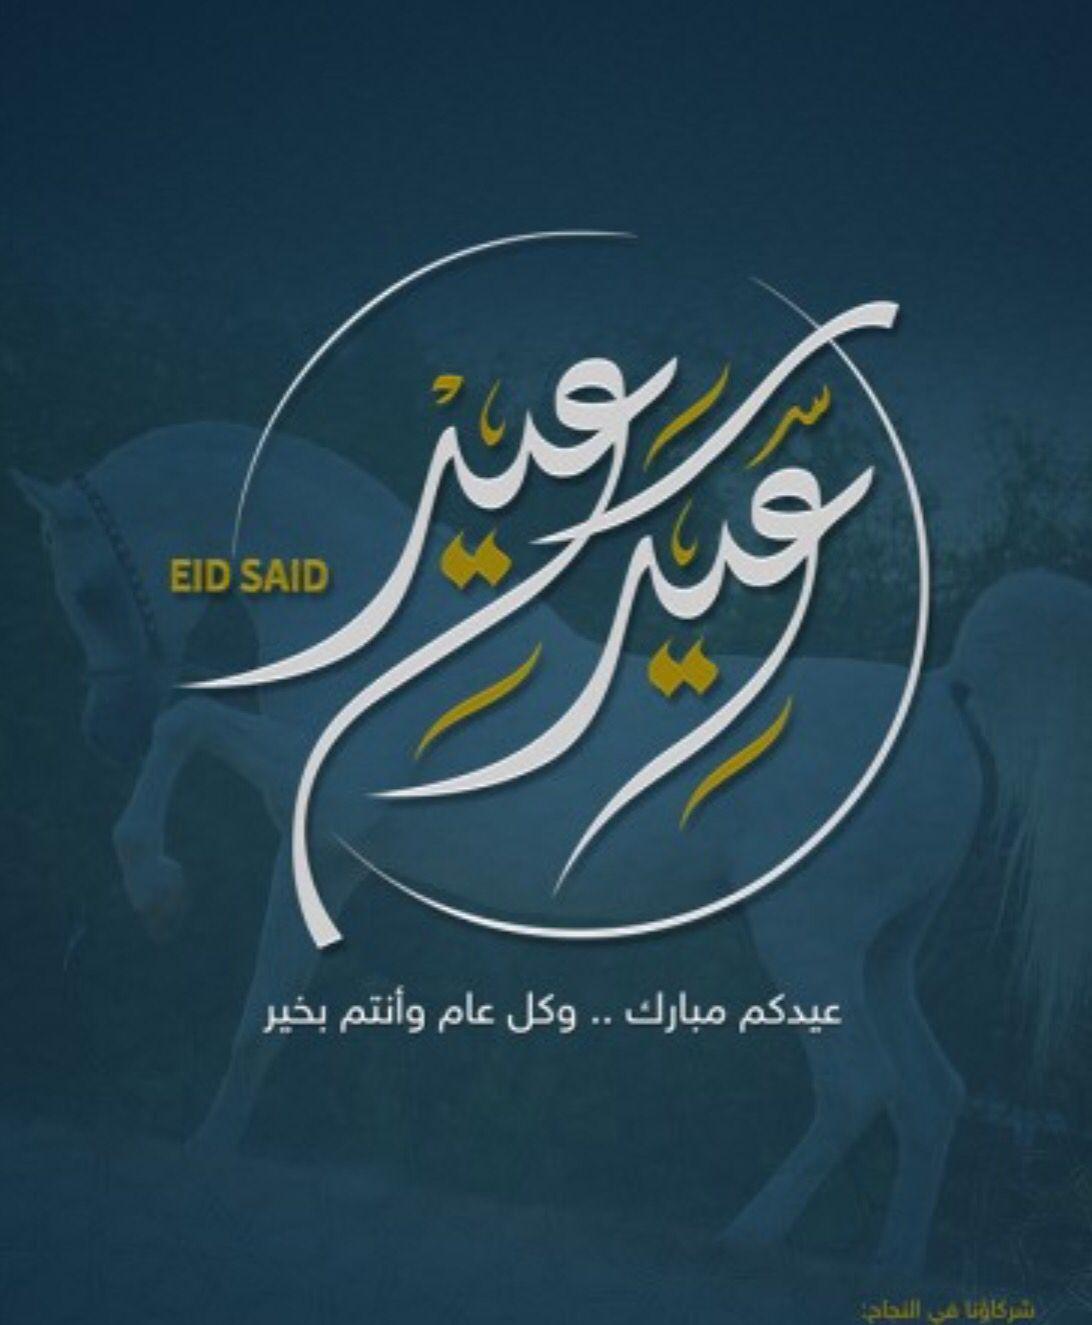 عيدكم مبارك Eid Greetings Calligraphy Art Eid